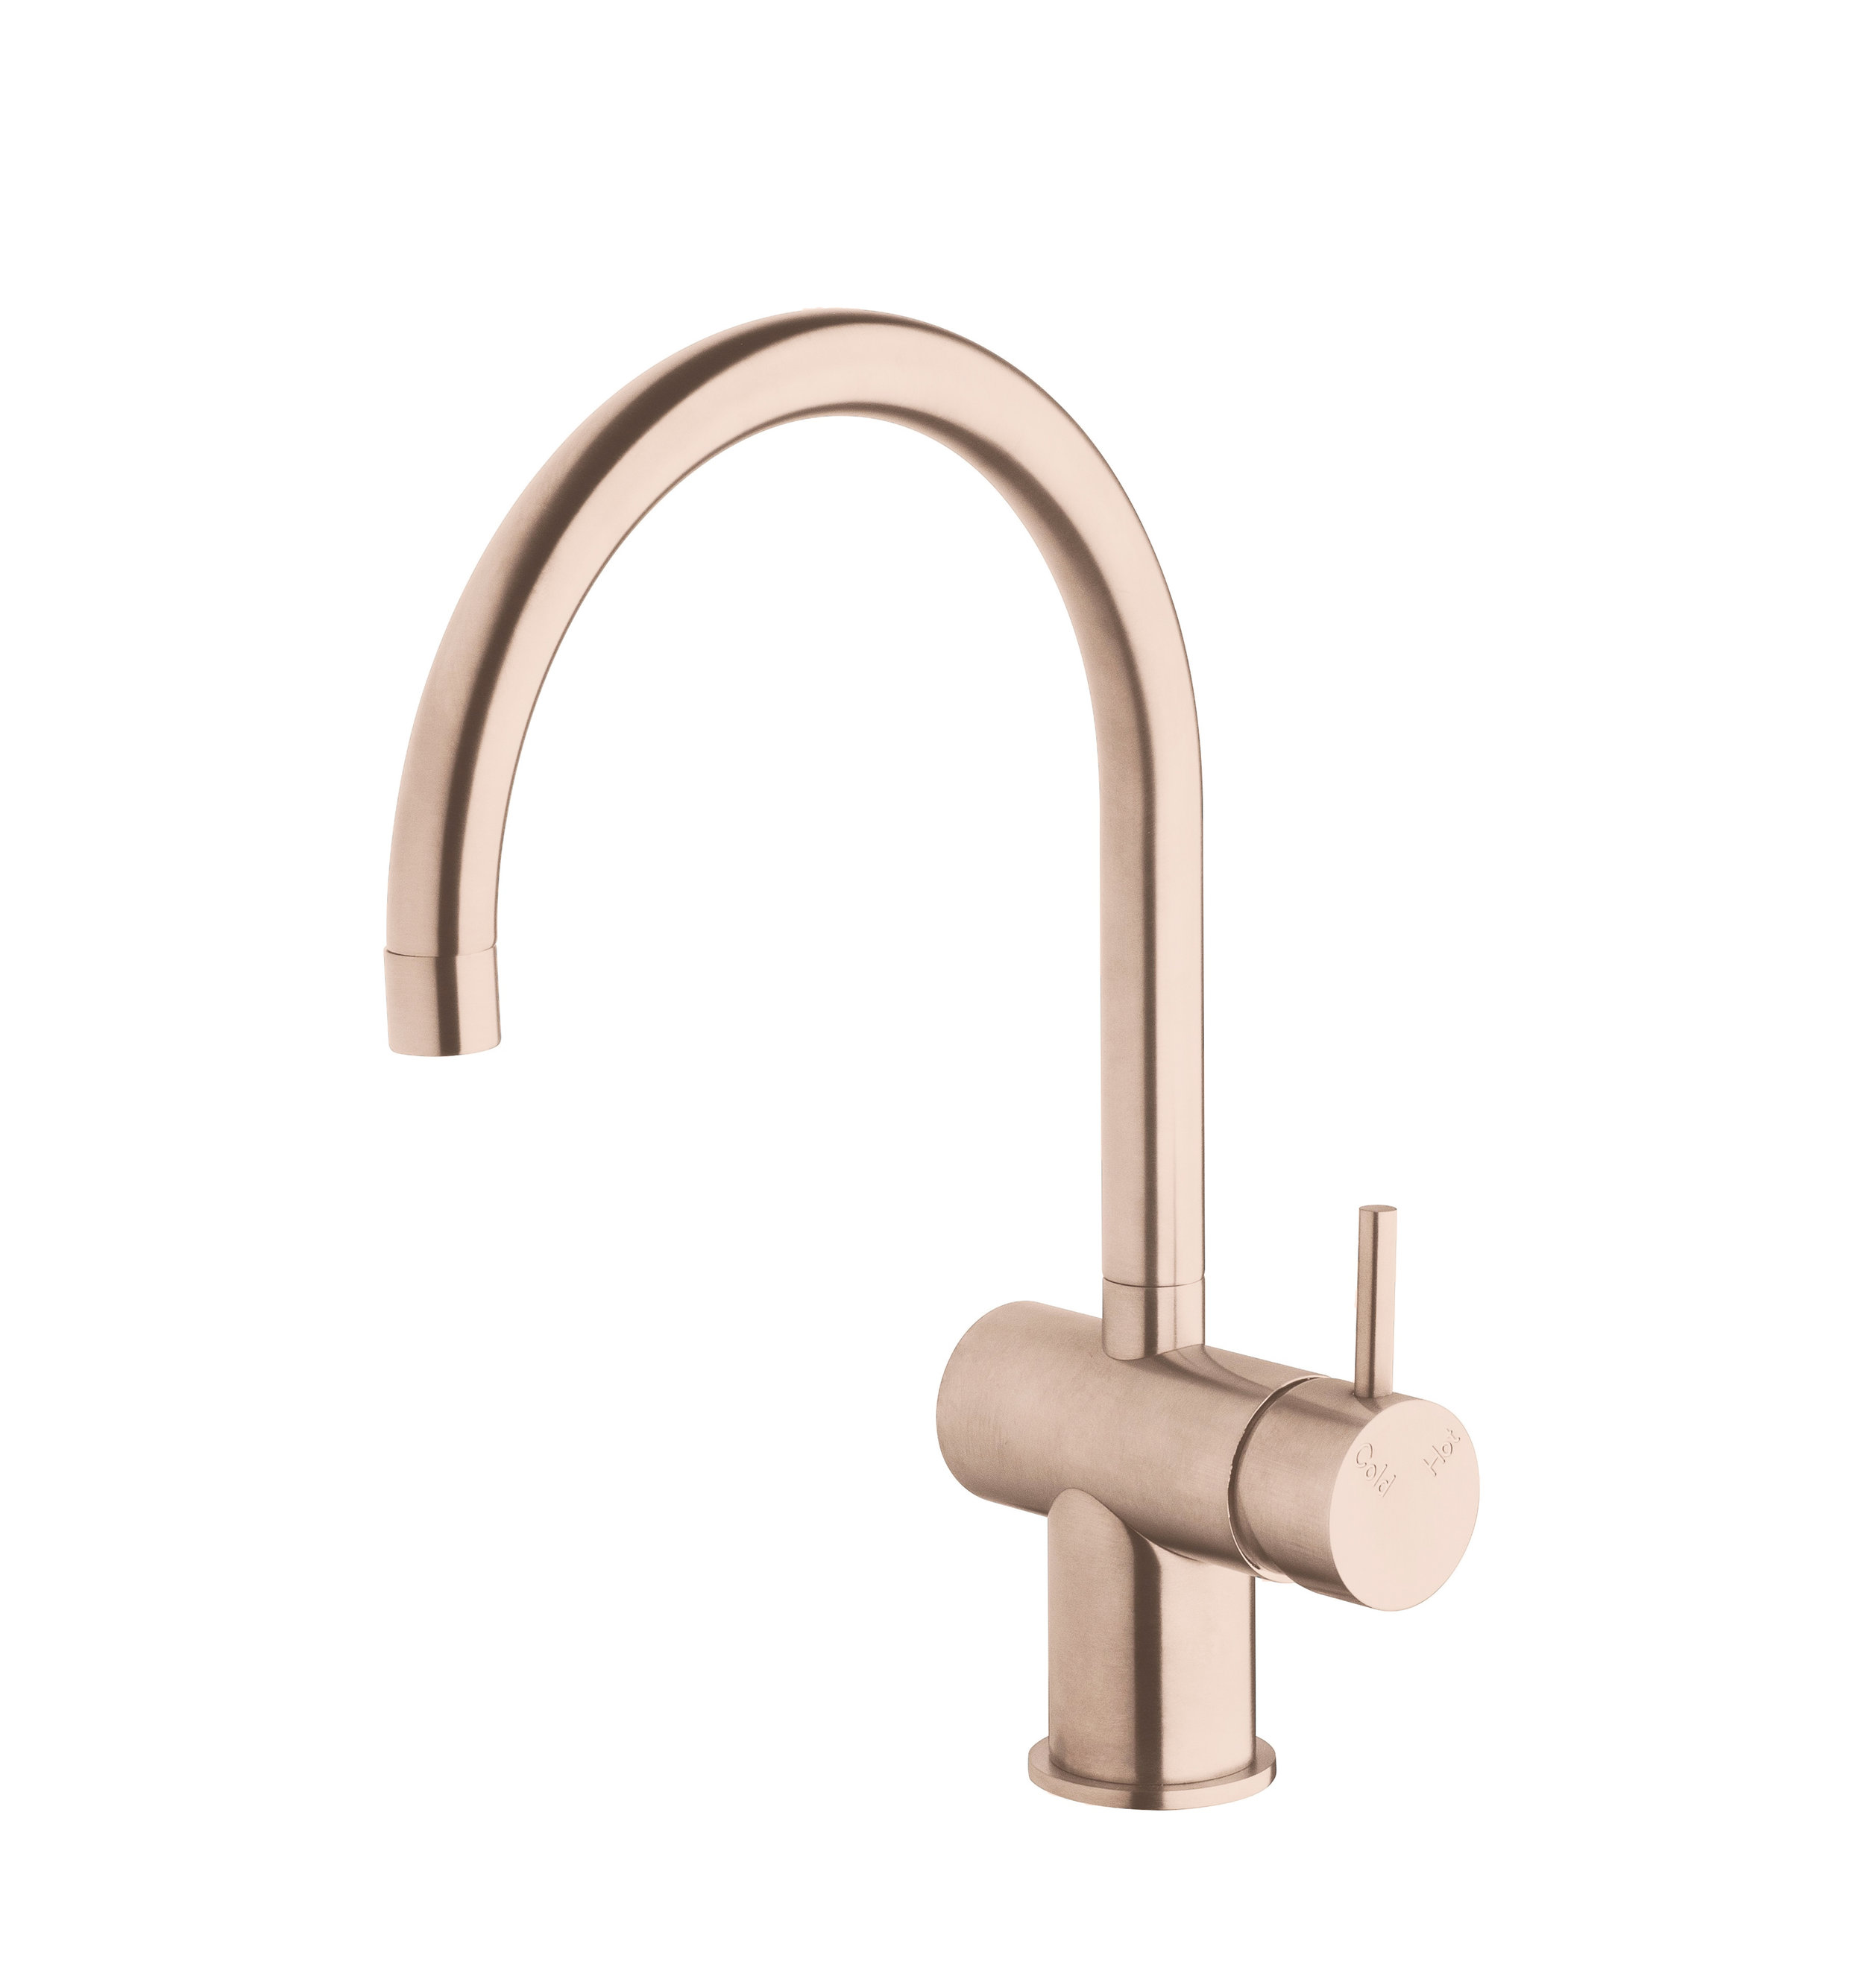 lowScala Sink Mixer Curv Lg RH Brushed Rose Gold.jpg